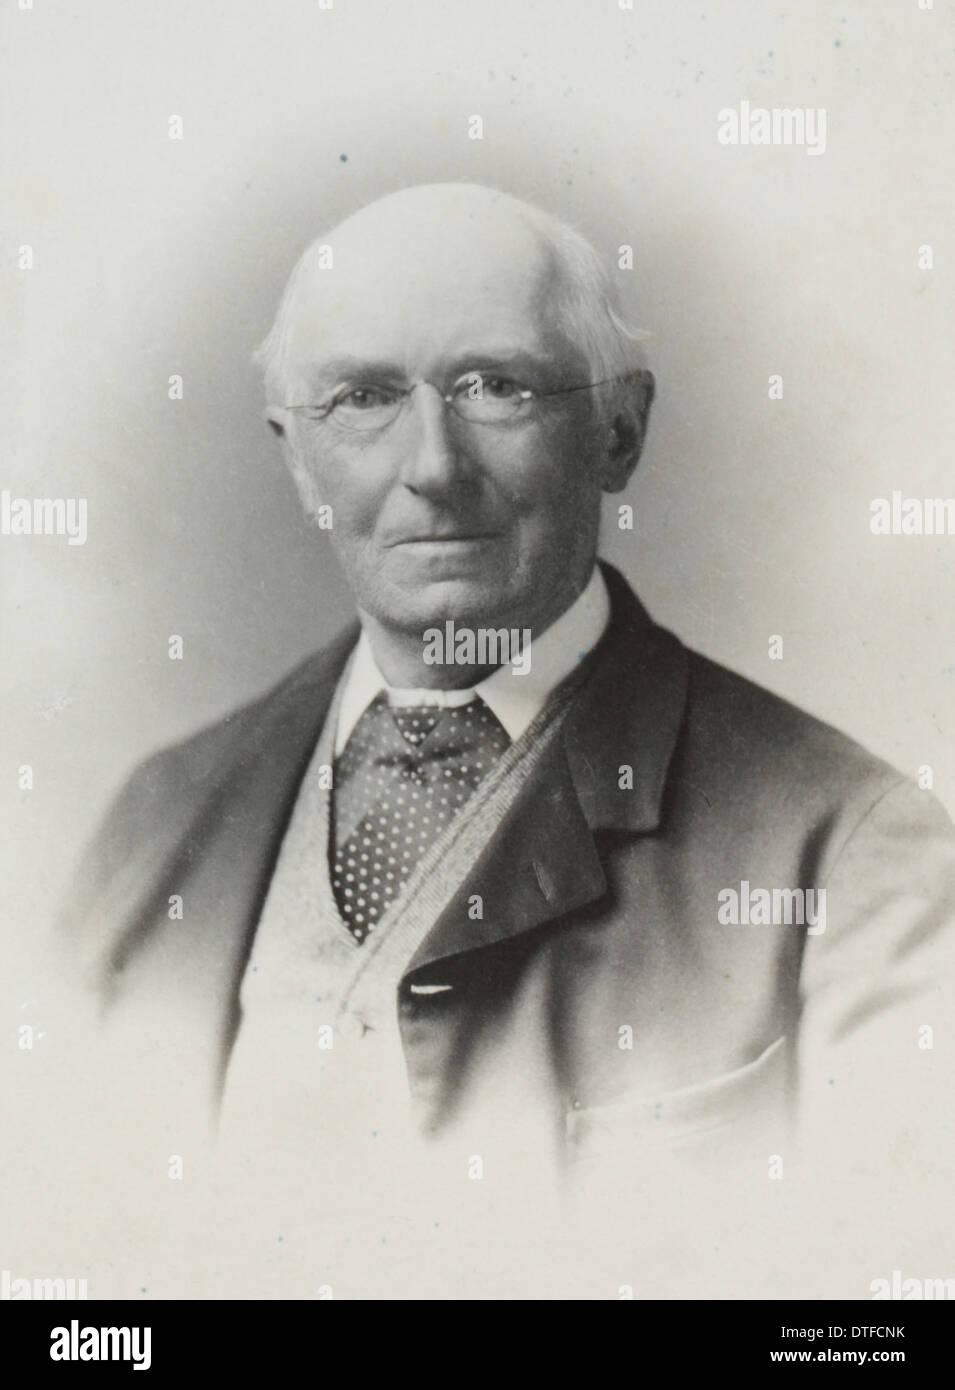 Albert Carl Ludwig Gotthilf Gunther (1830-1914) - Stock Image